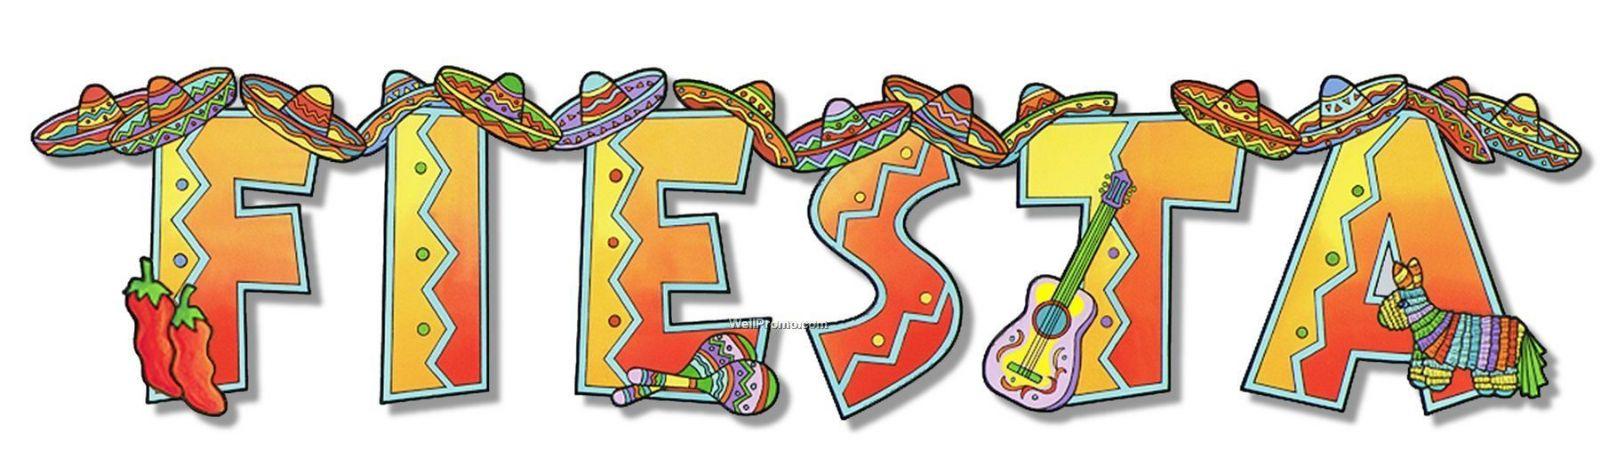 1600x474 Mexican Fiesta Border Clip Art